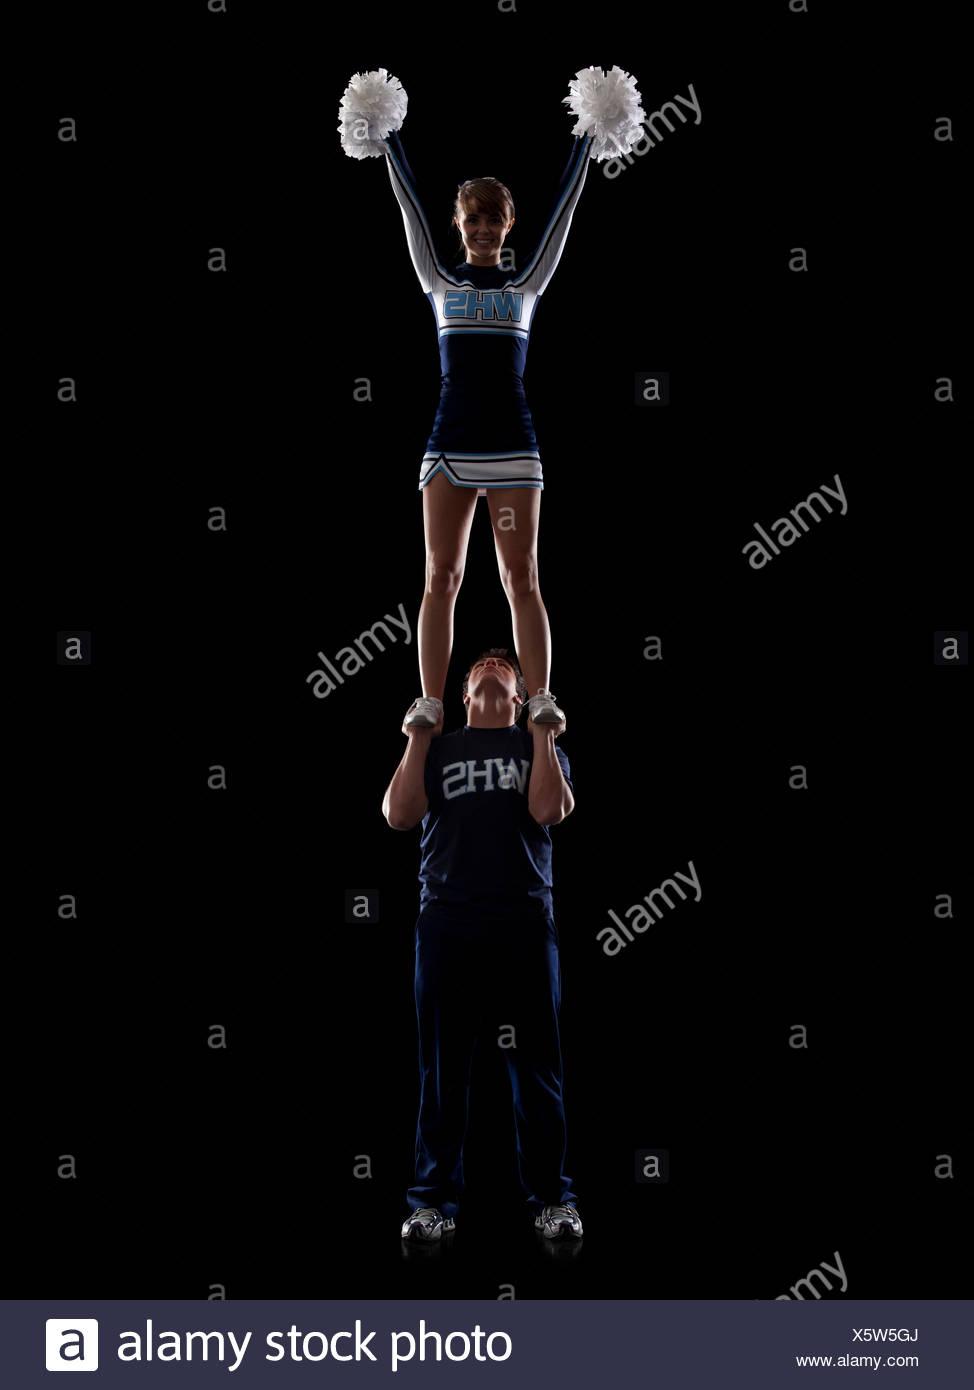 Teenage sportsman(16-17) holding aloft teenage cheerleader girl (16-17) - Stock Image